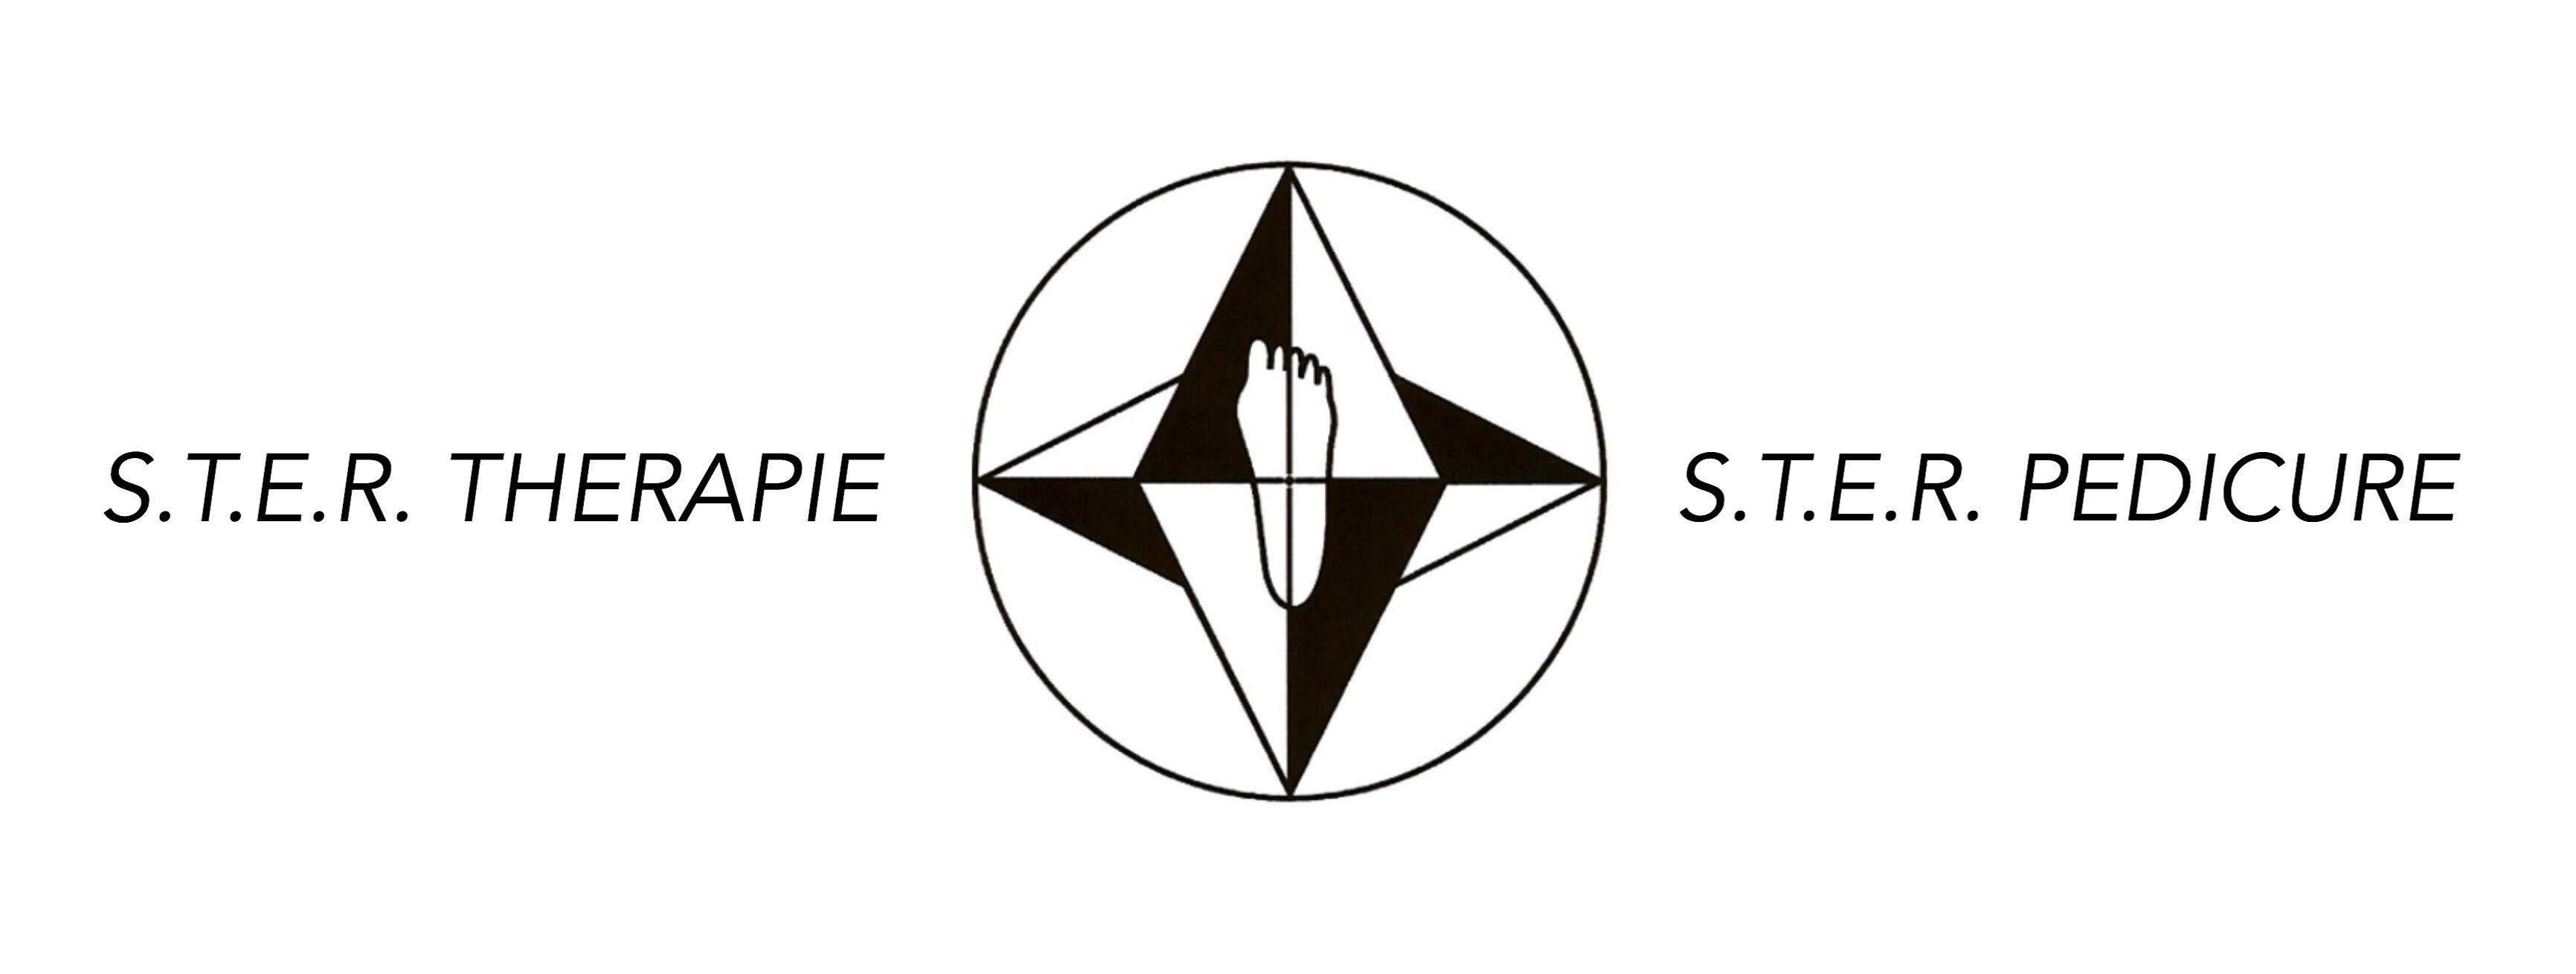 Praktijk S.T.E.R. Therapie & Pedicure